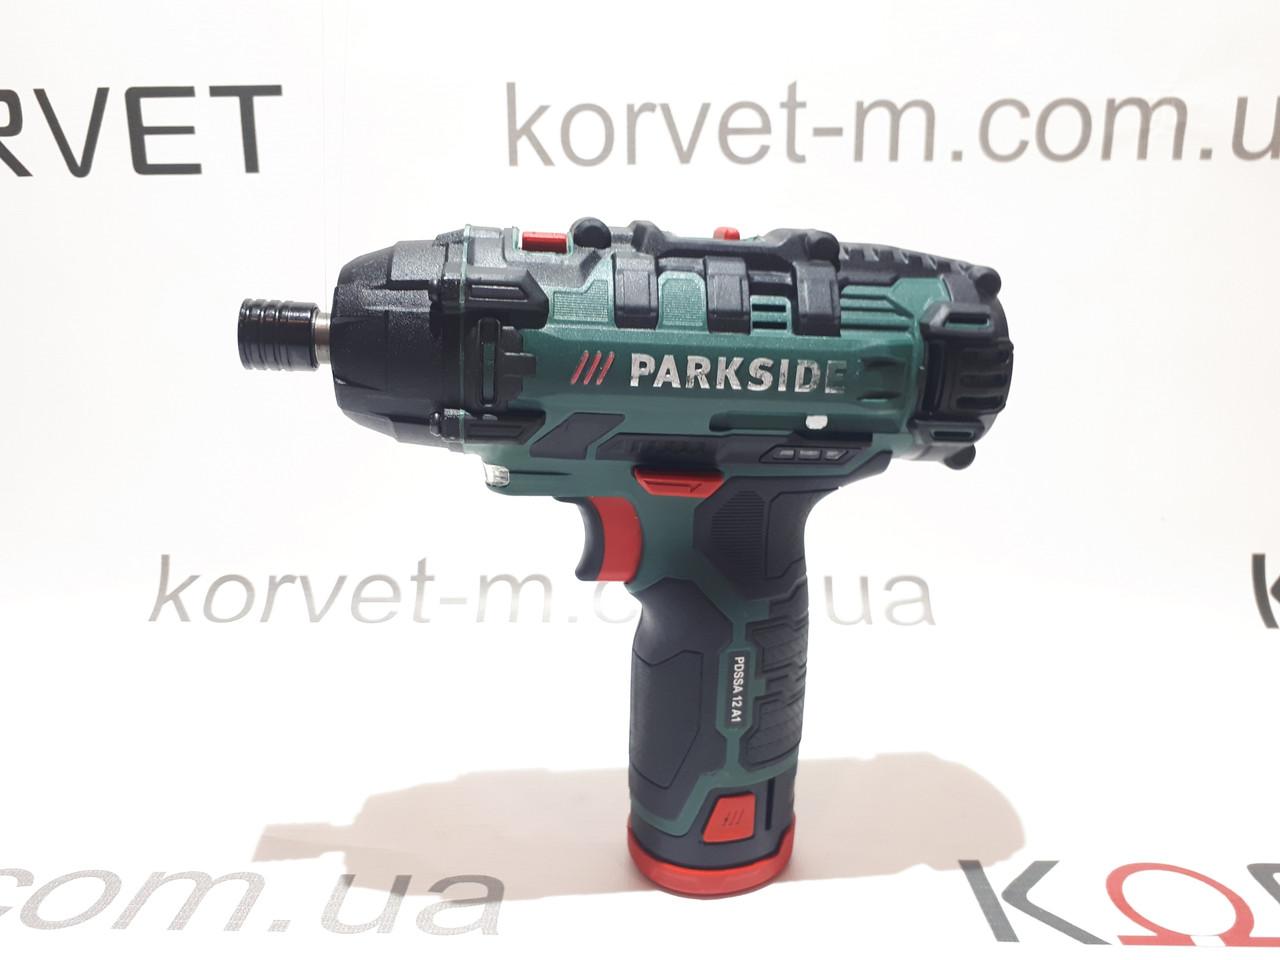 Аккумуляторный ударный шуруповерт гайковерт , импакт Parkside 12v PDSSA 12 A1